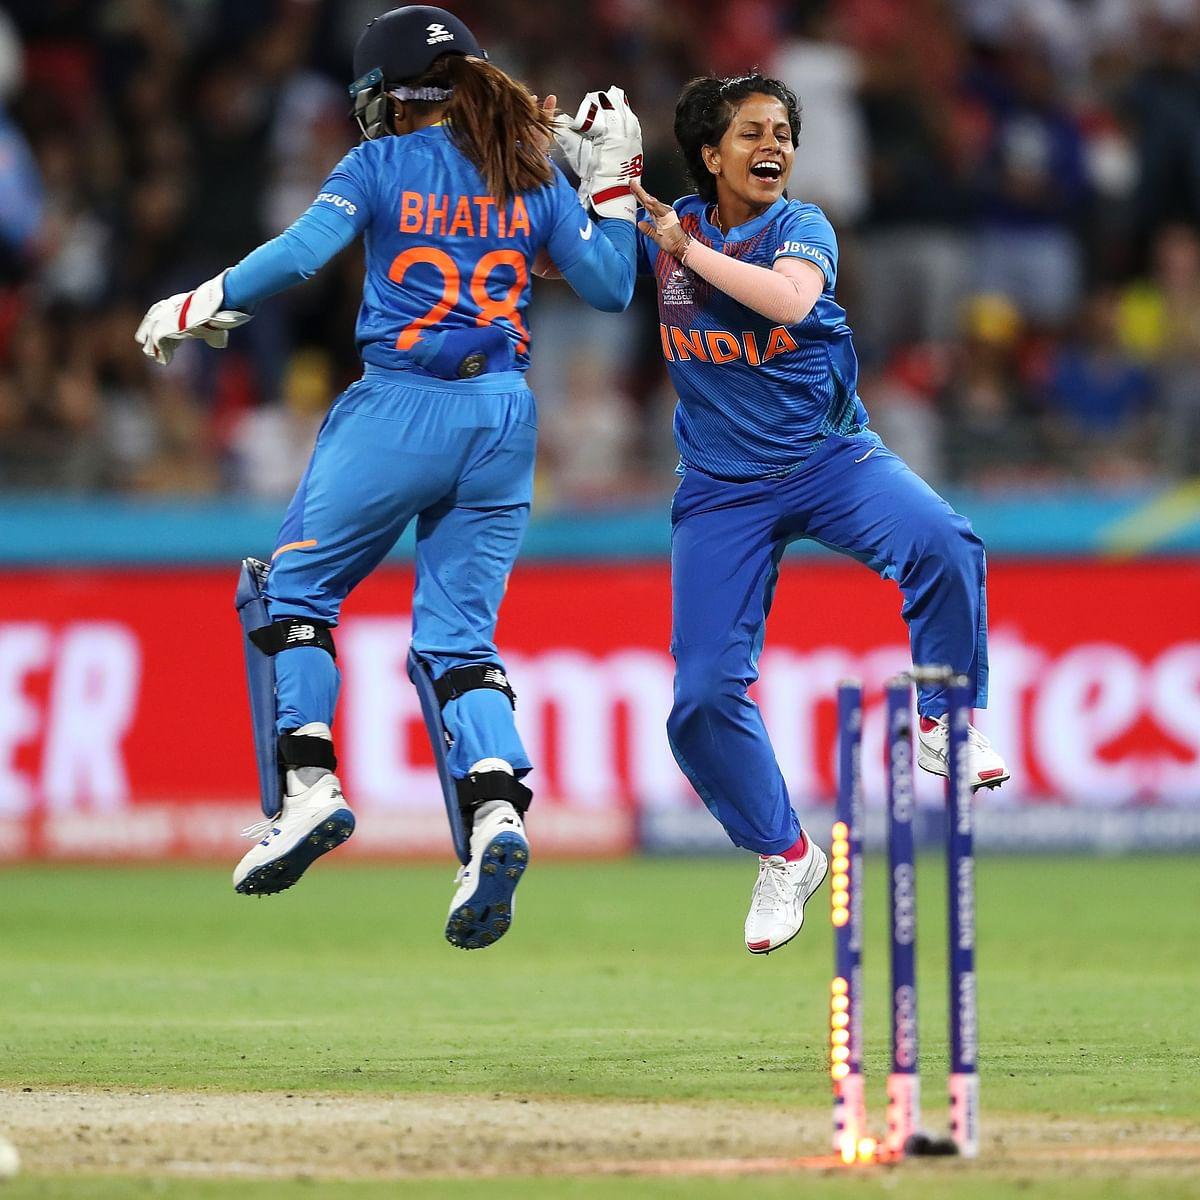 ICC Women's T20 World Cup AUS vs IND: Poonam Yadav, Taniya Bhatia star as India win by 17 runs